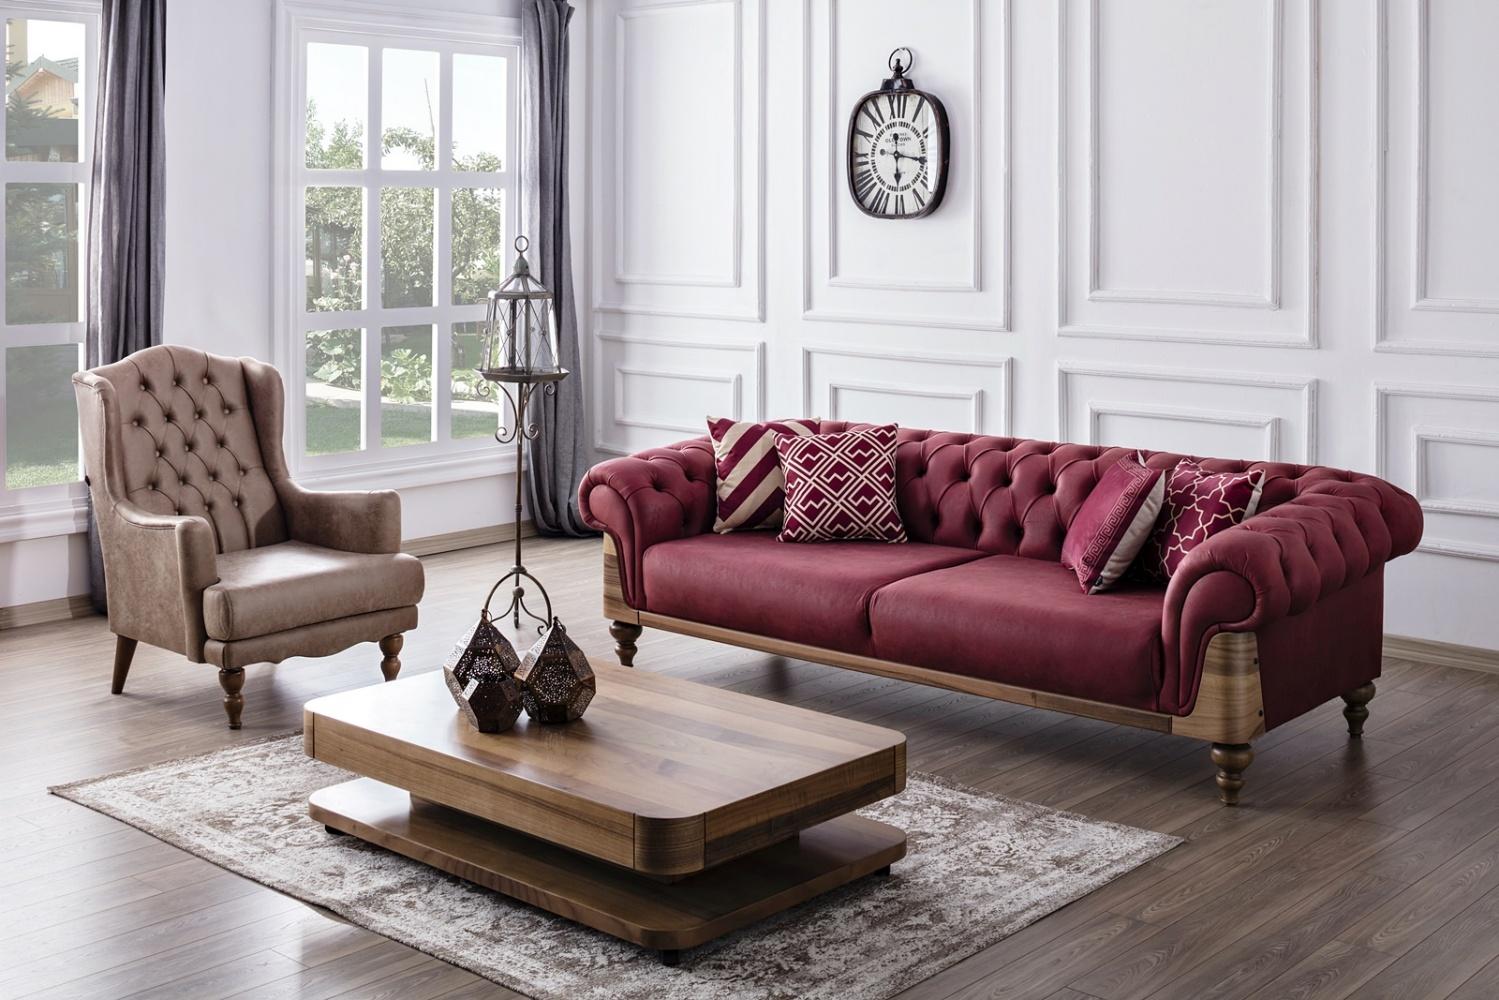 DesignSofa_BarockSofa_ChesterfieldSofa_DesignCouchVitala_FNL0871copy